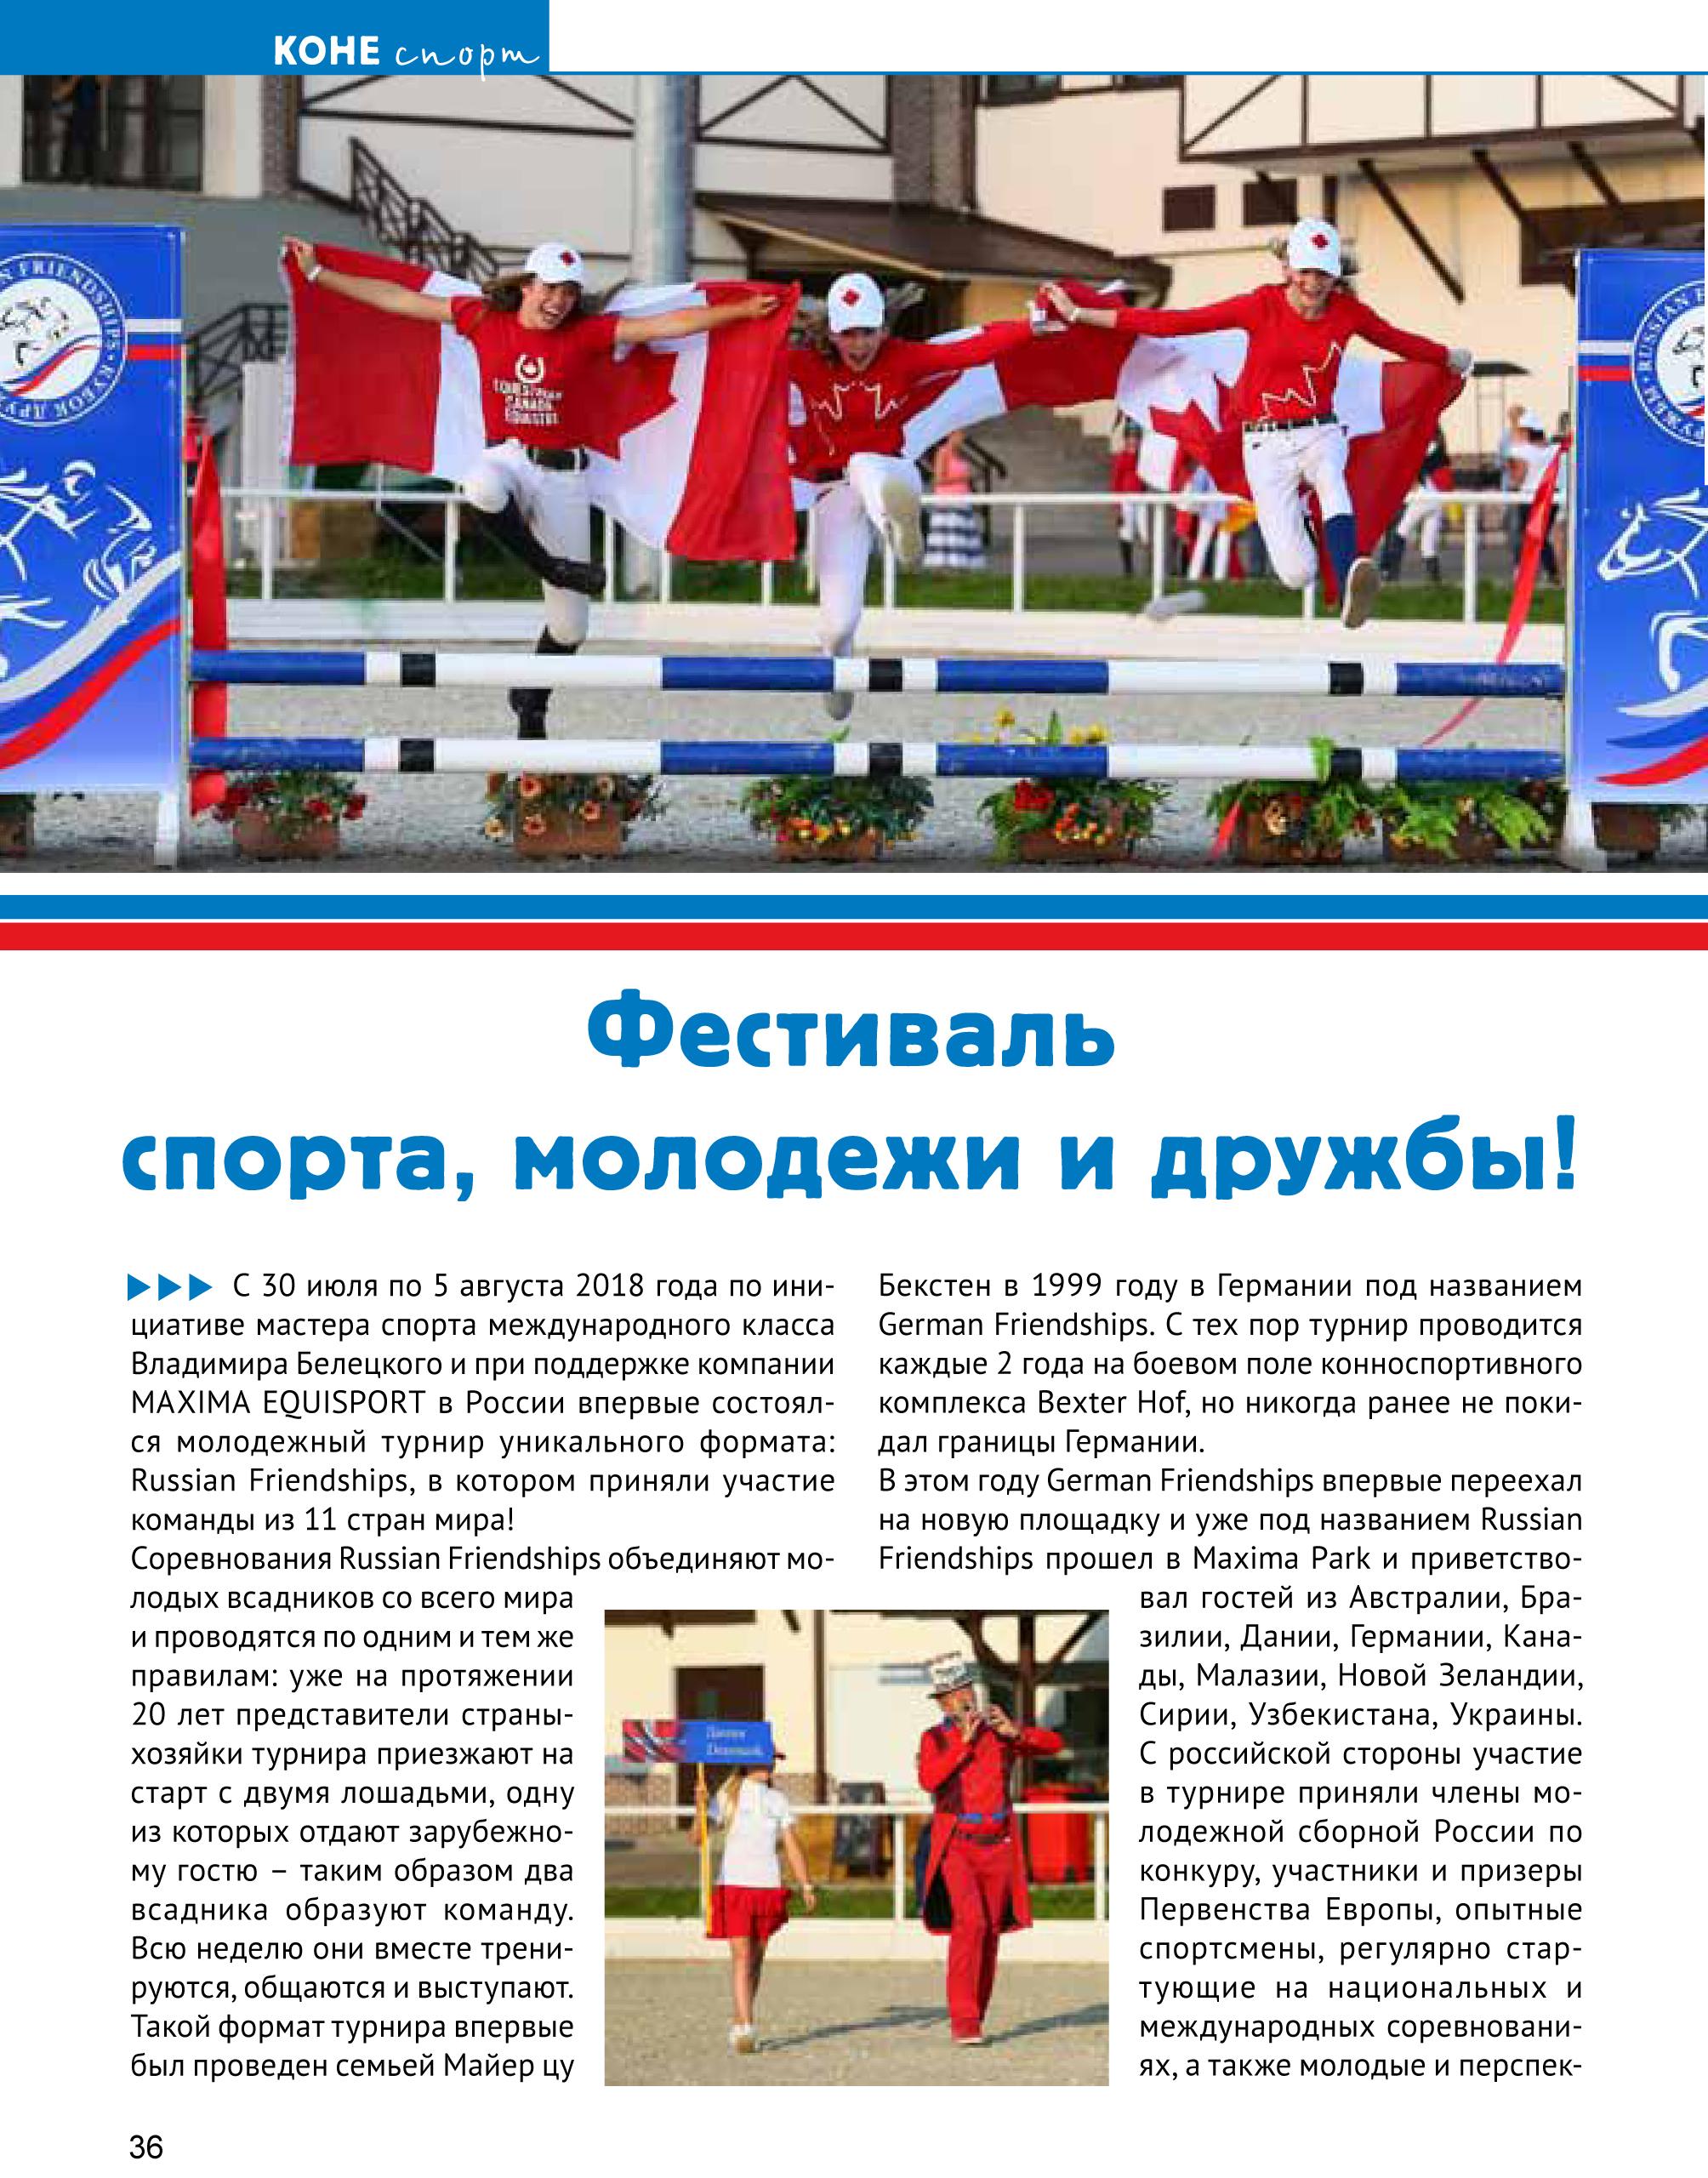 Book 5 2018 ДЛЯ САЙТА-36